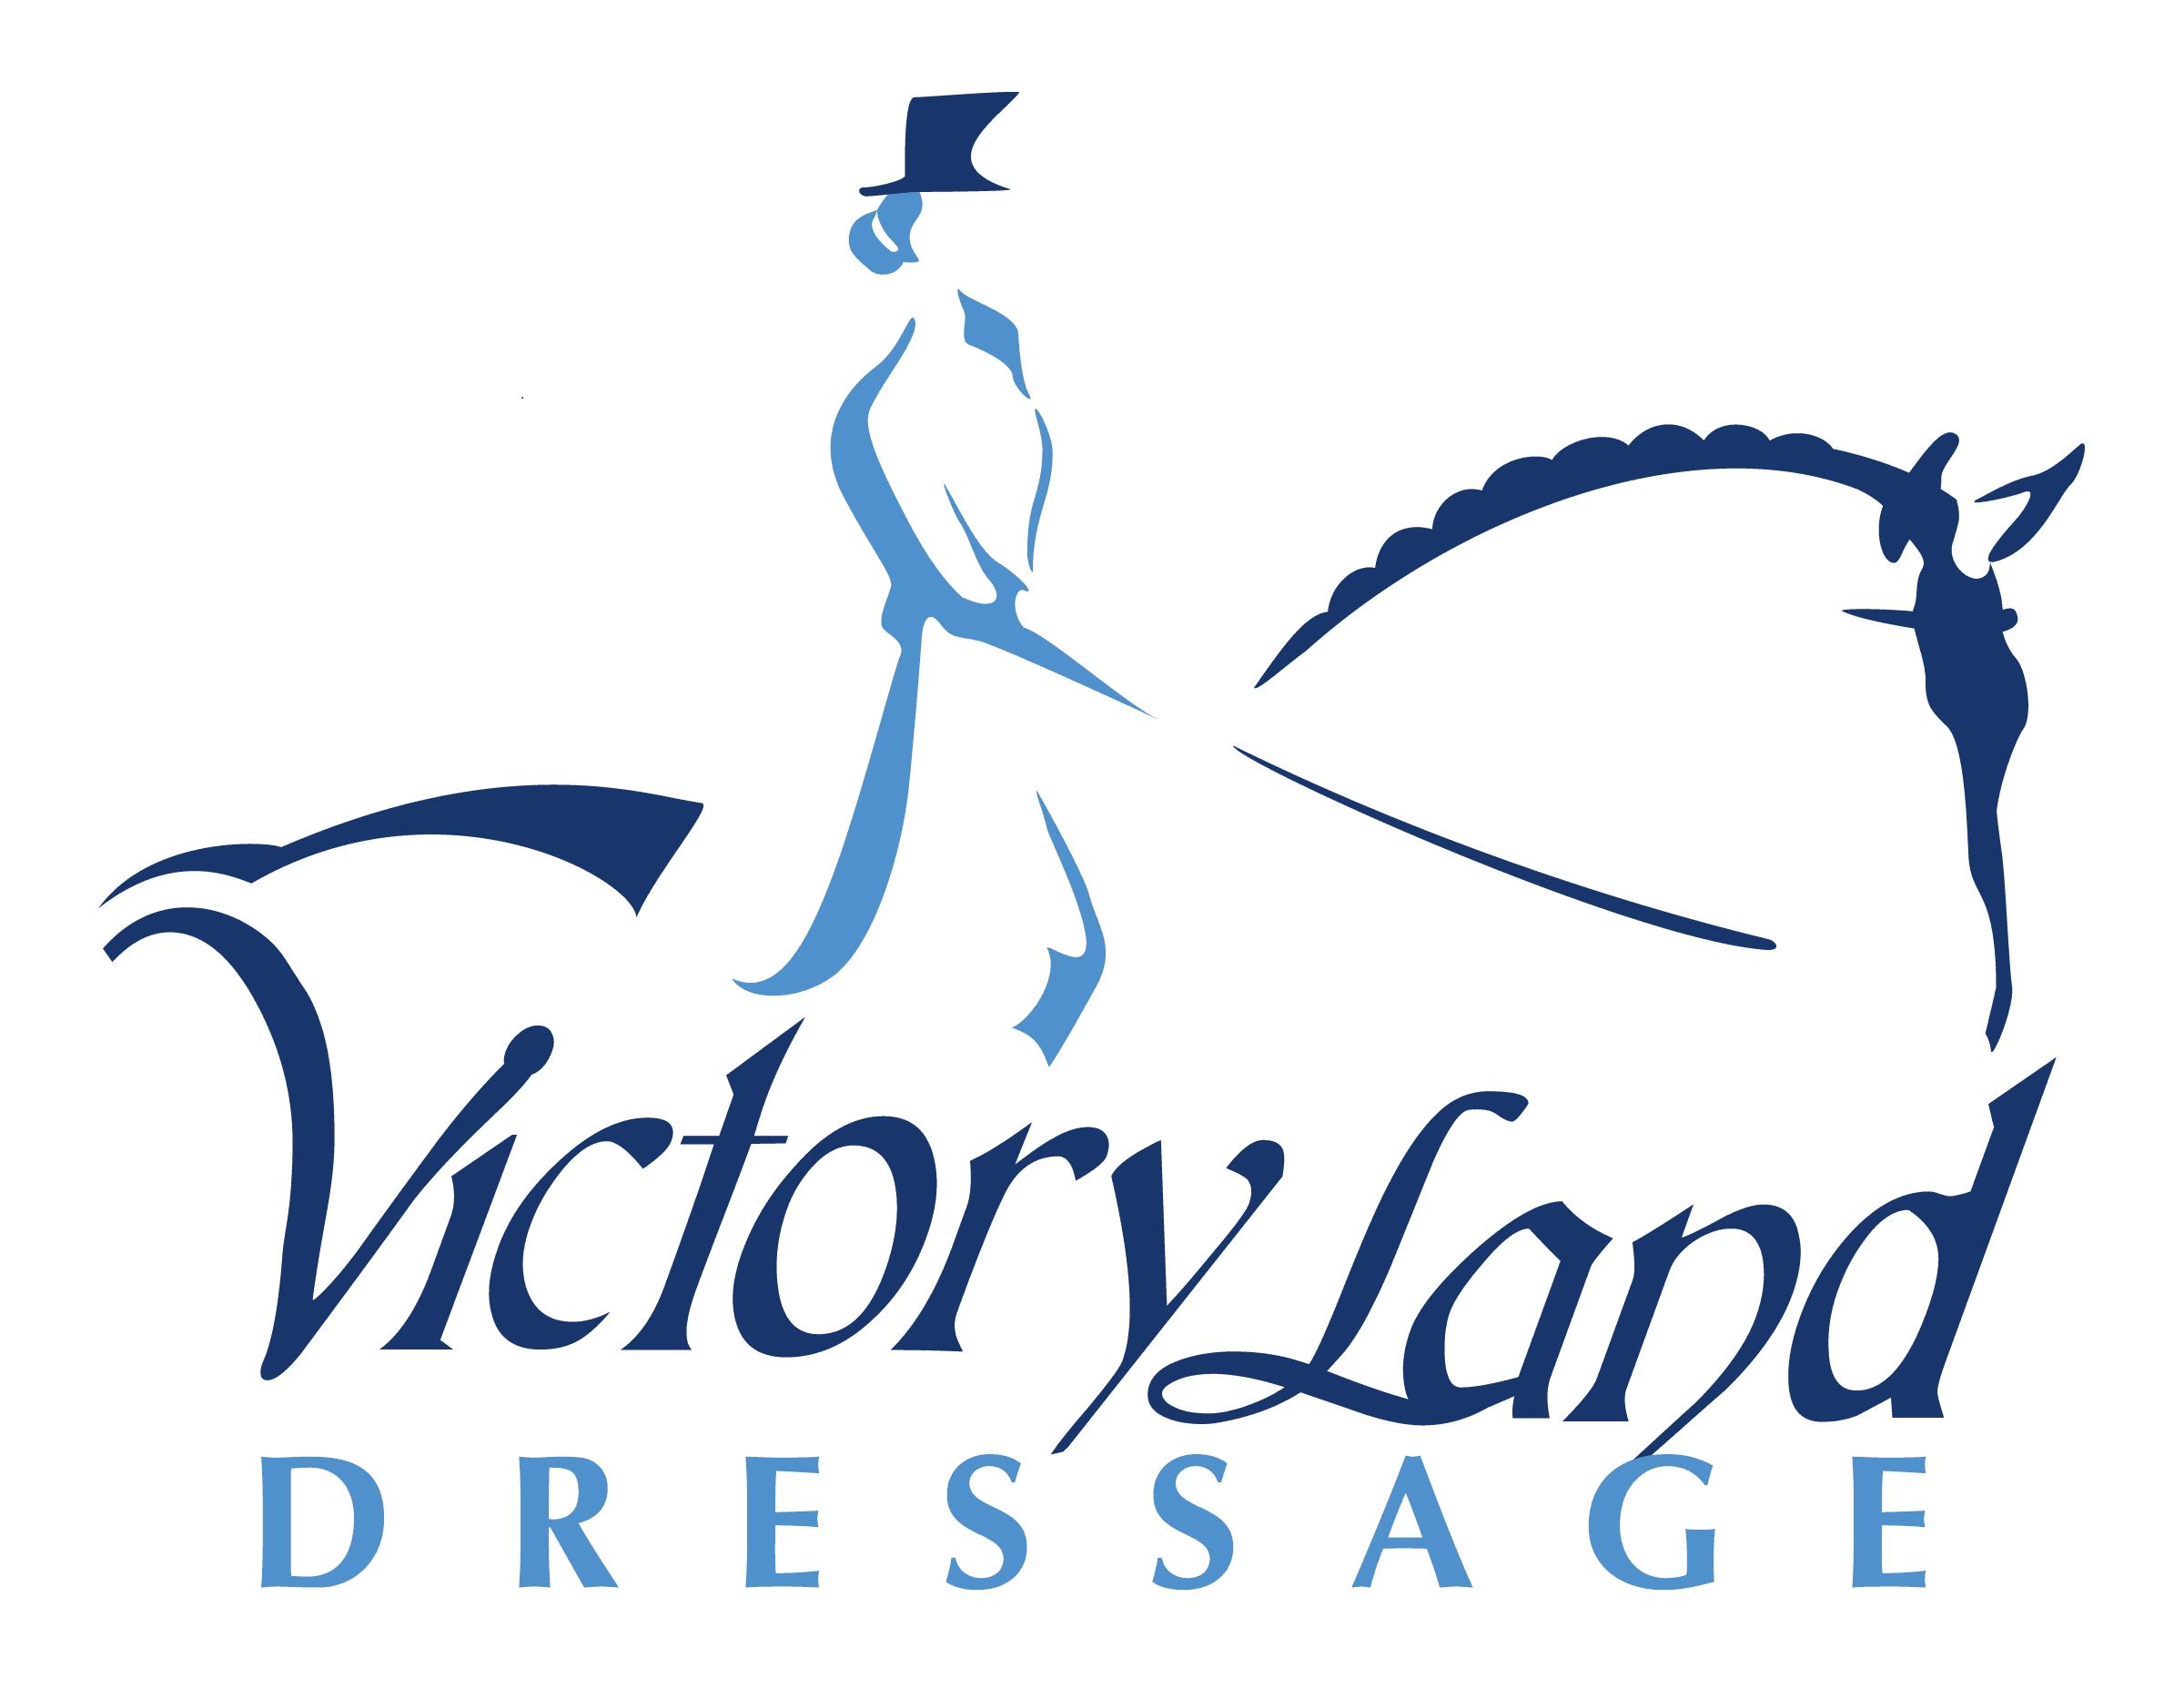 Victory Land Dressage image 1